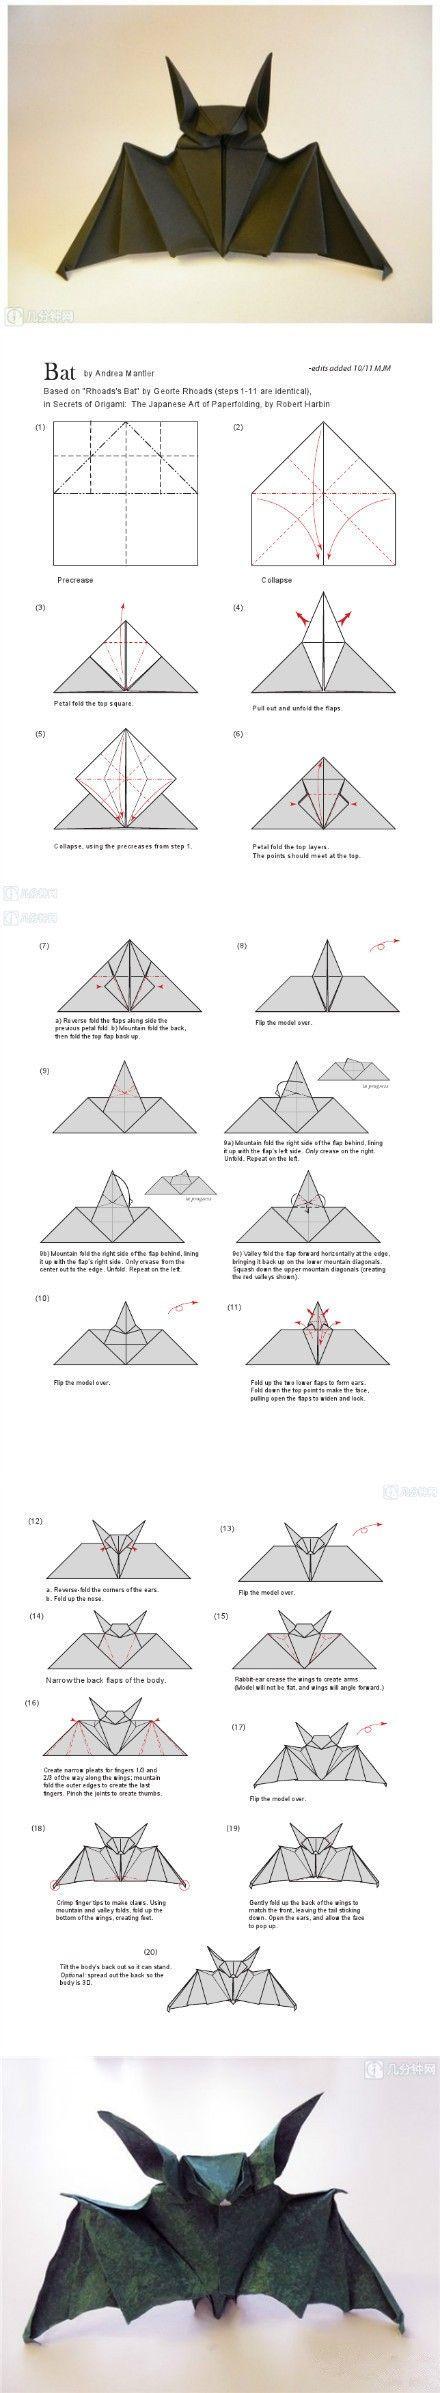 DIY - Bat origami for Halloween (Source : http://www.duitang.com/people/mblog/76799420/detail/) #halloween #bat #origami #diy